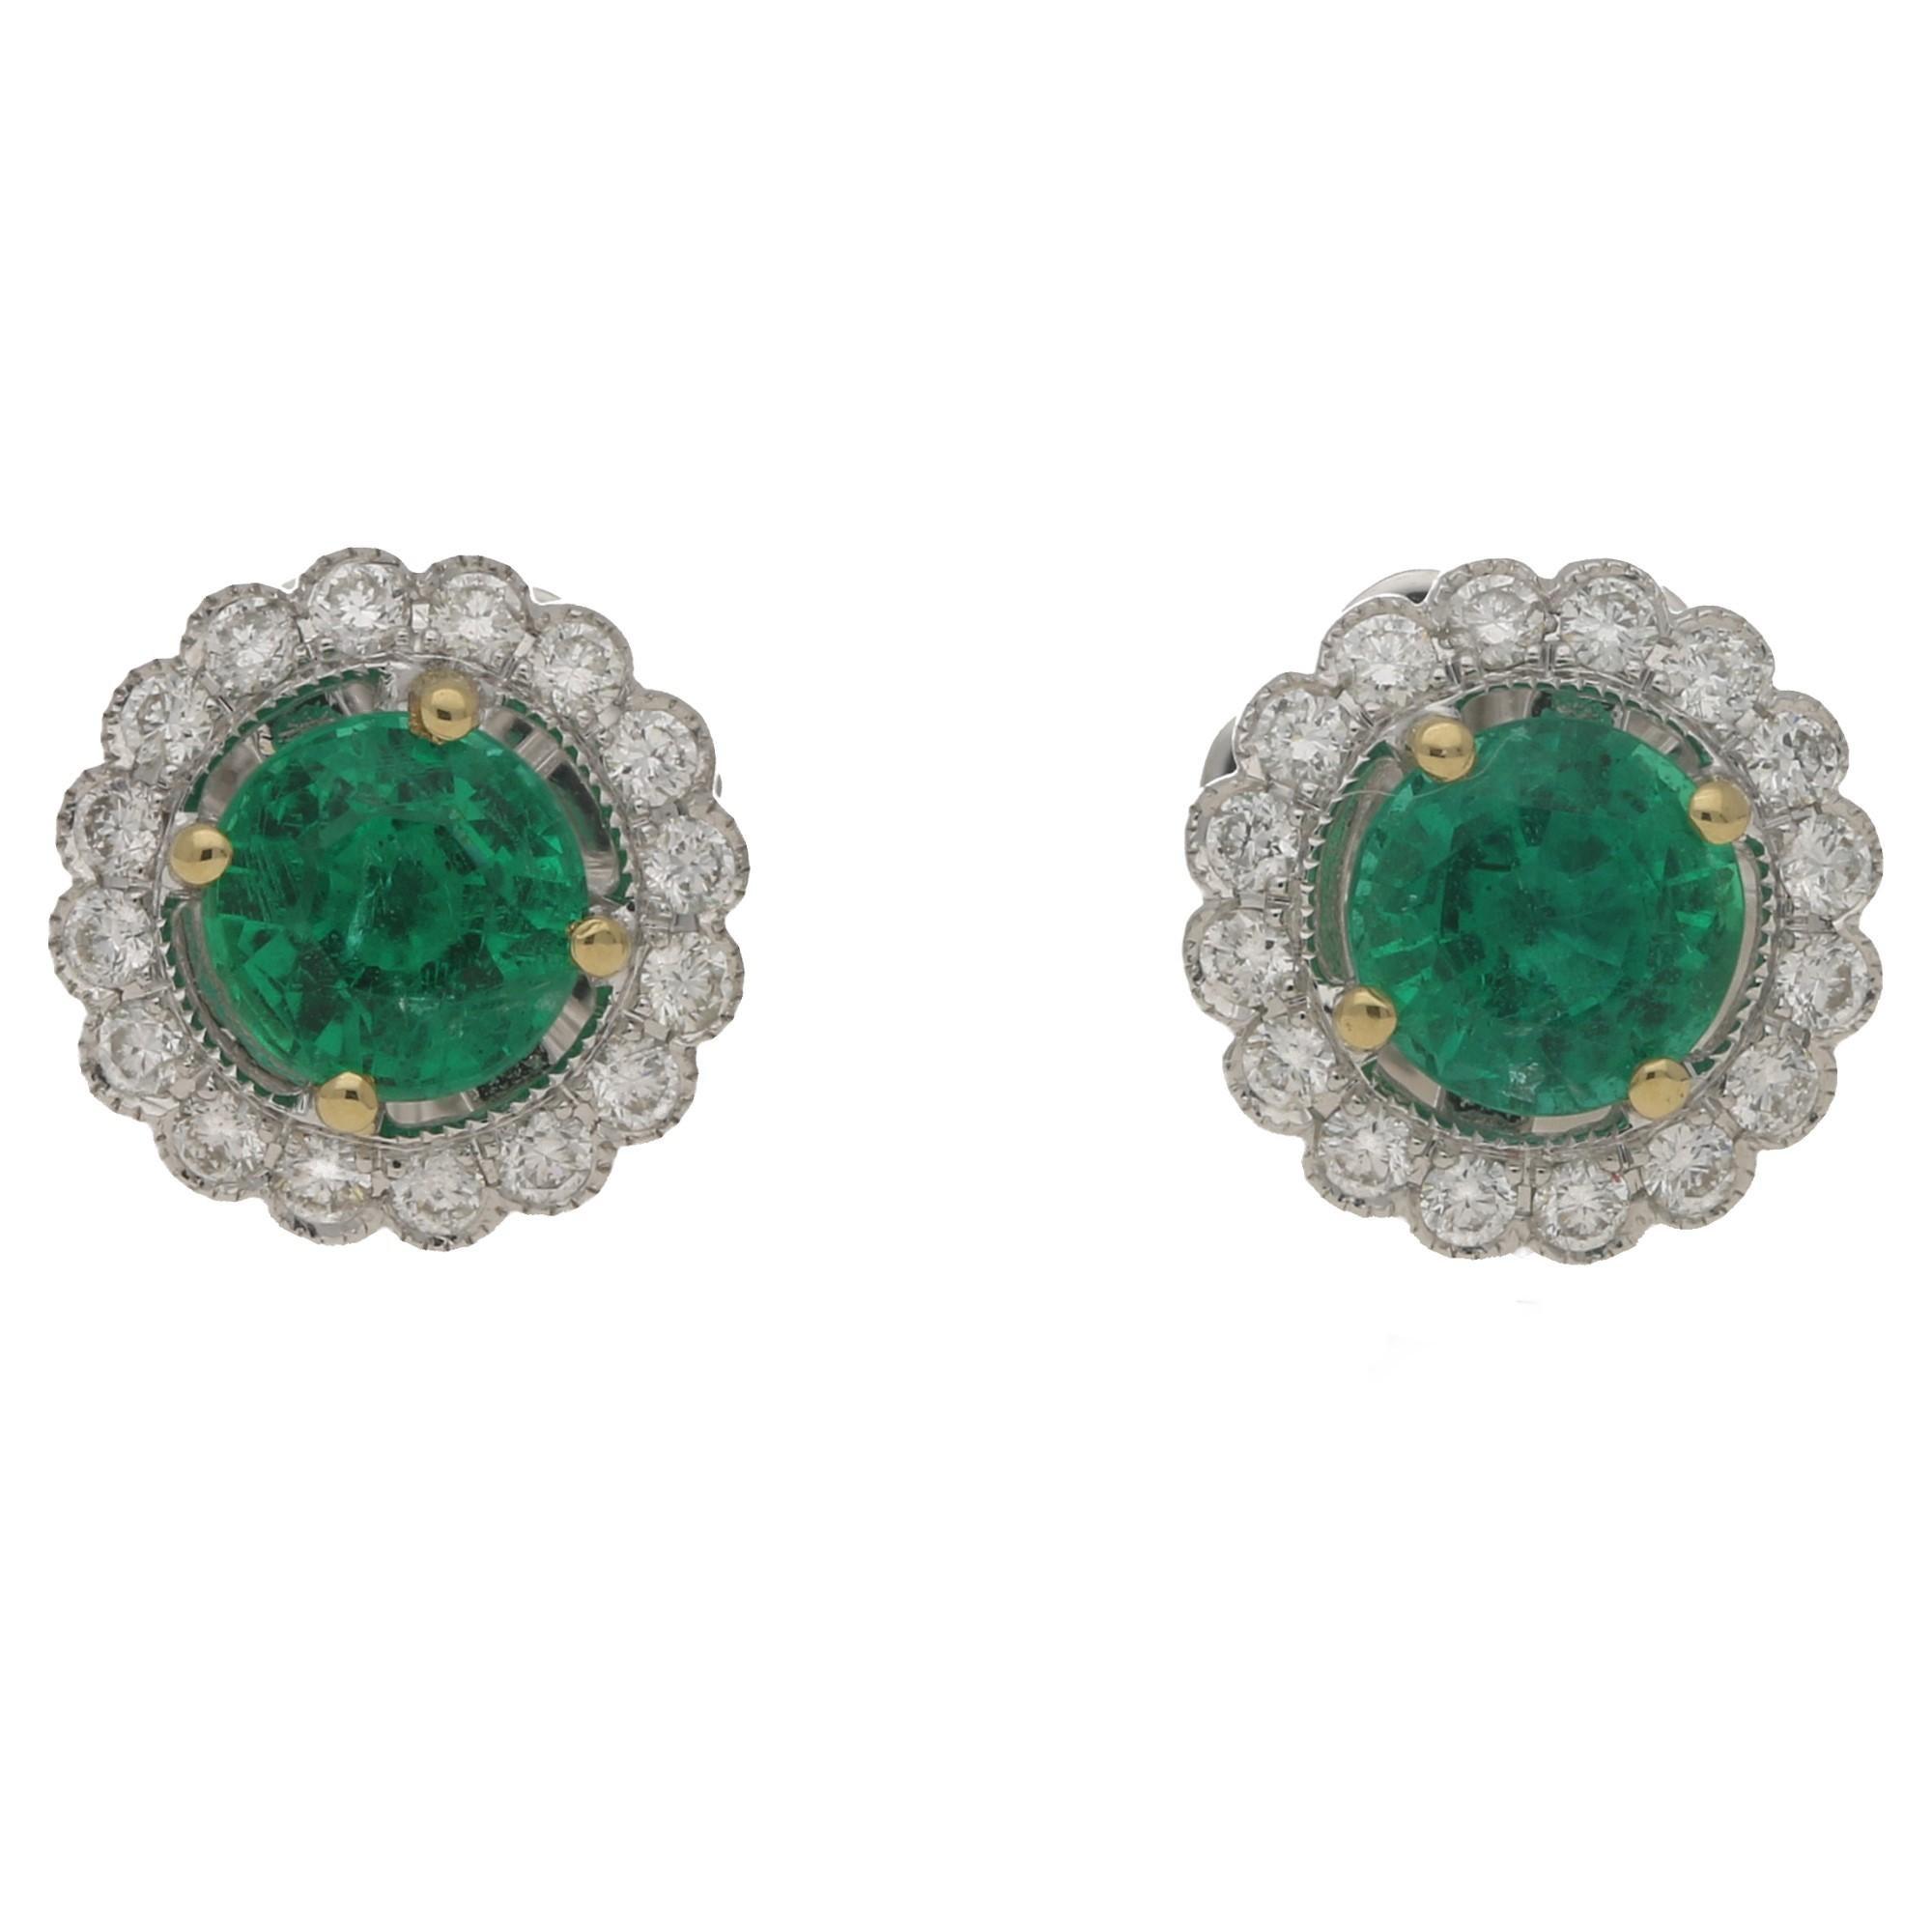 18 Karat Gold Emerald Diamond Cluster Stud Earrings